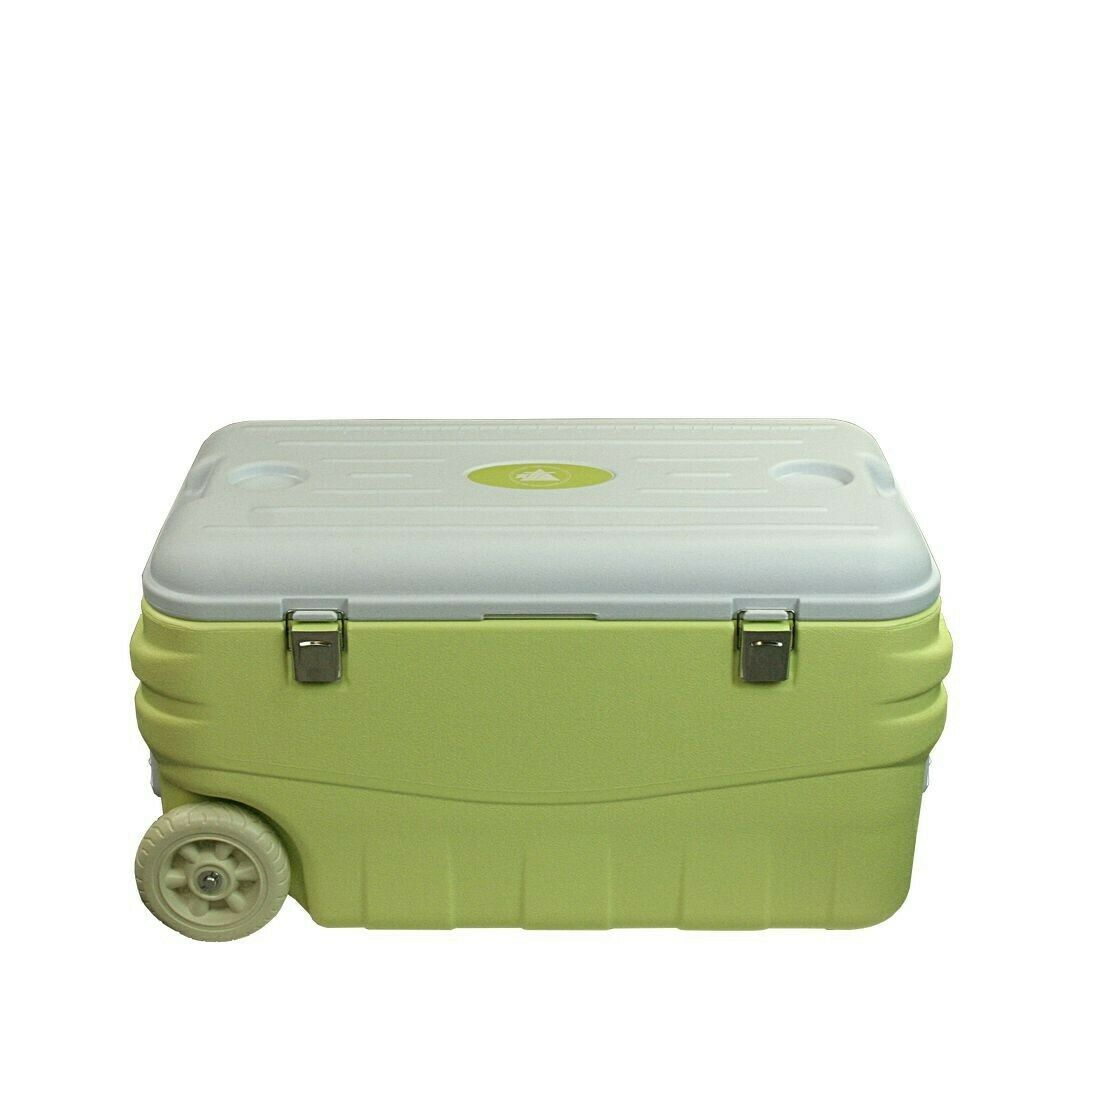 Fridgo 80L passive cool box 89x43x43cm PU Thermobox warm cold insulating box